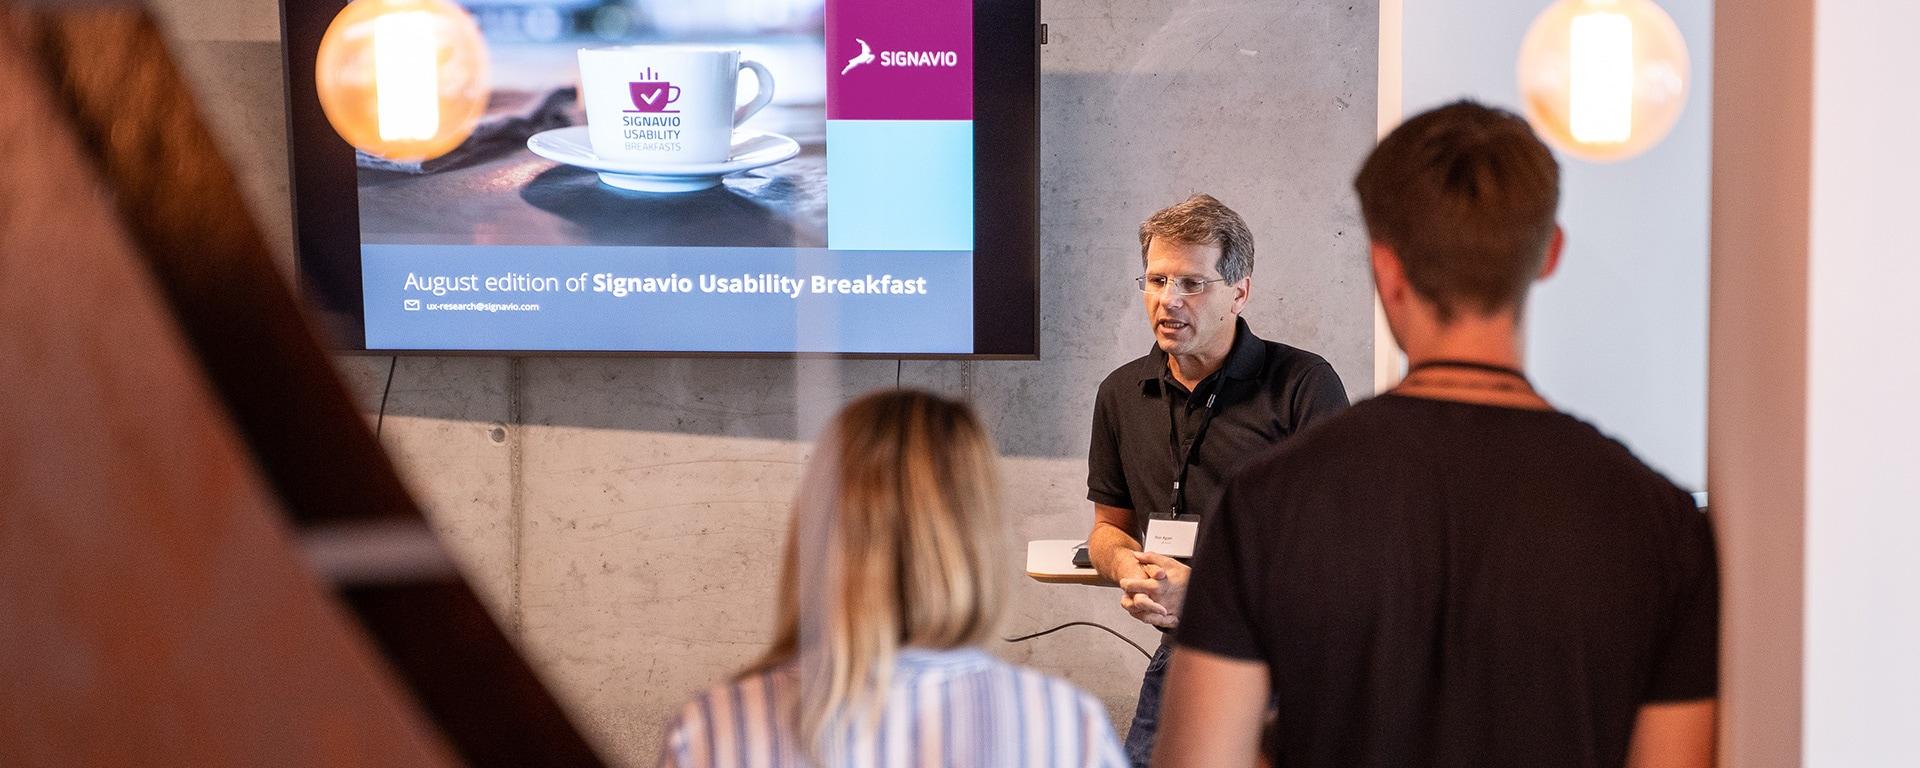 customer usability breakfast blog header image